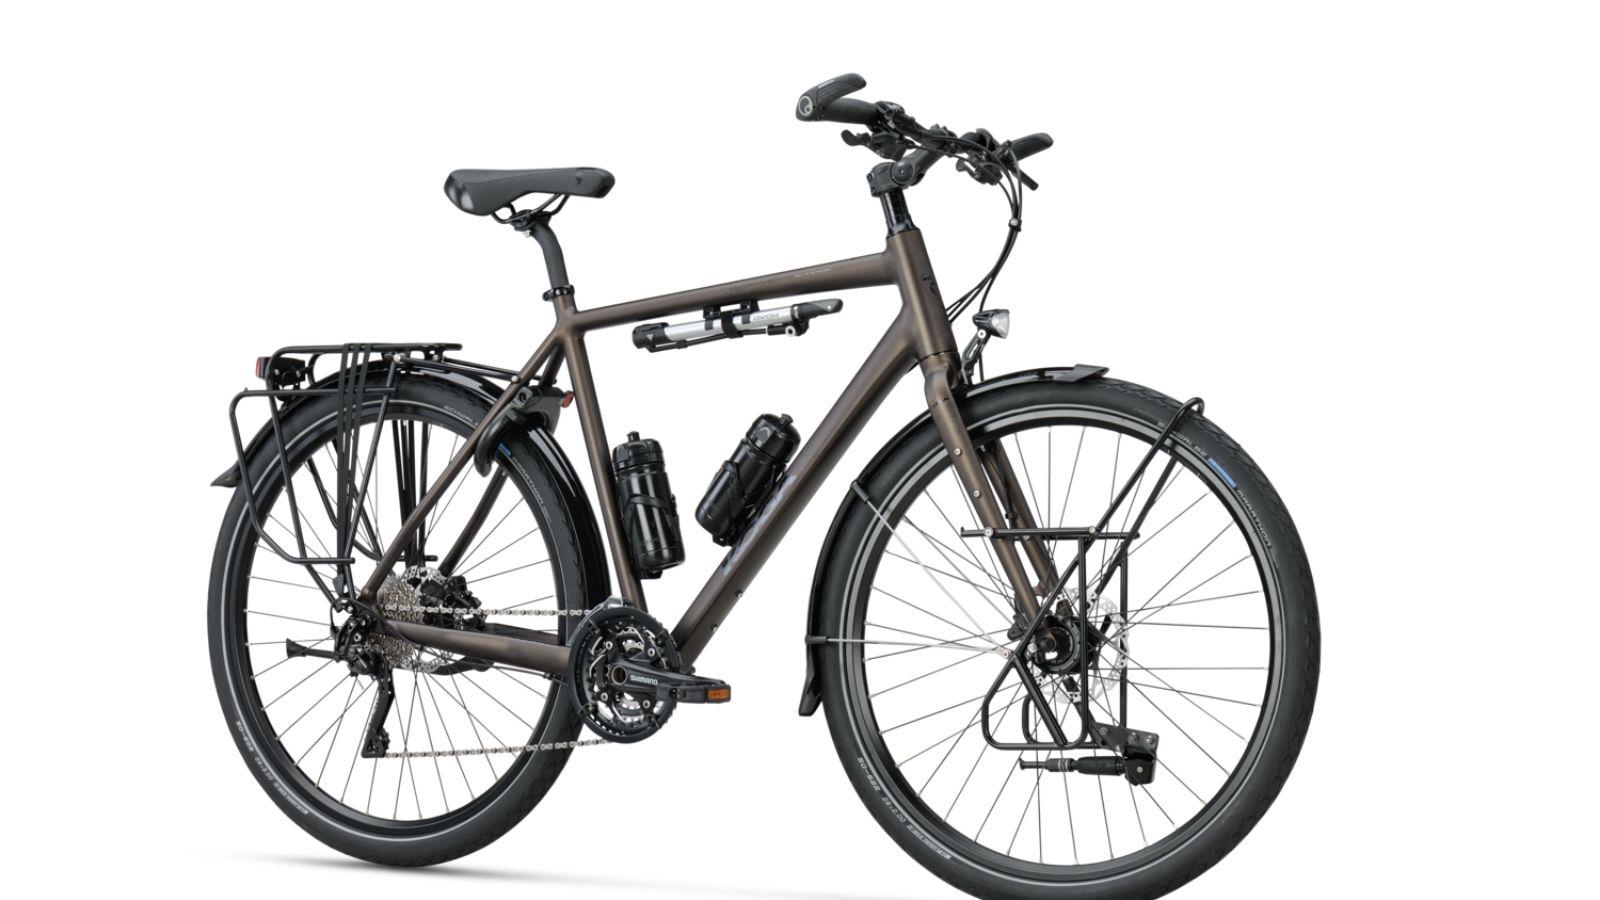 La bici da cicloturismo Koga World Traveller-s